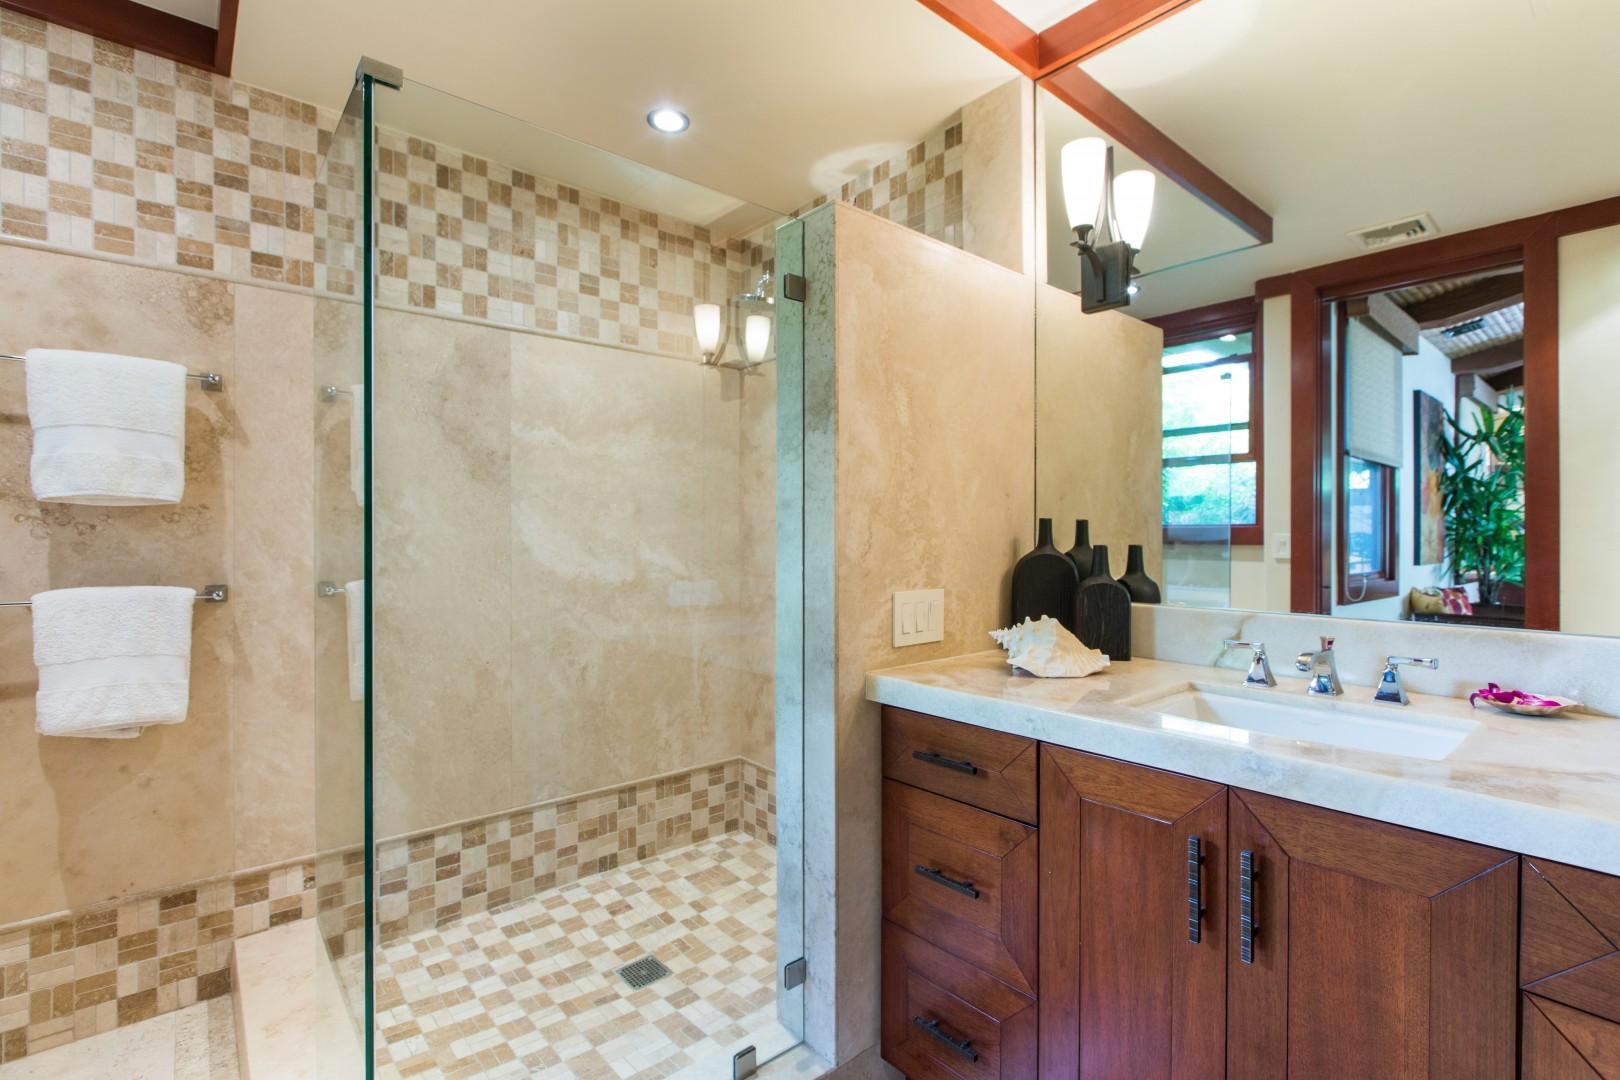 Upstairs Guest Room Bathroom